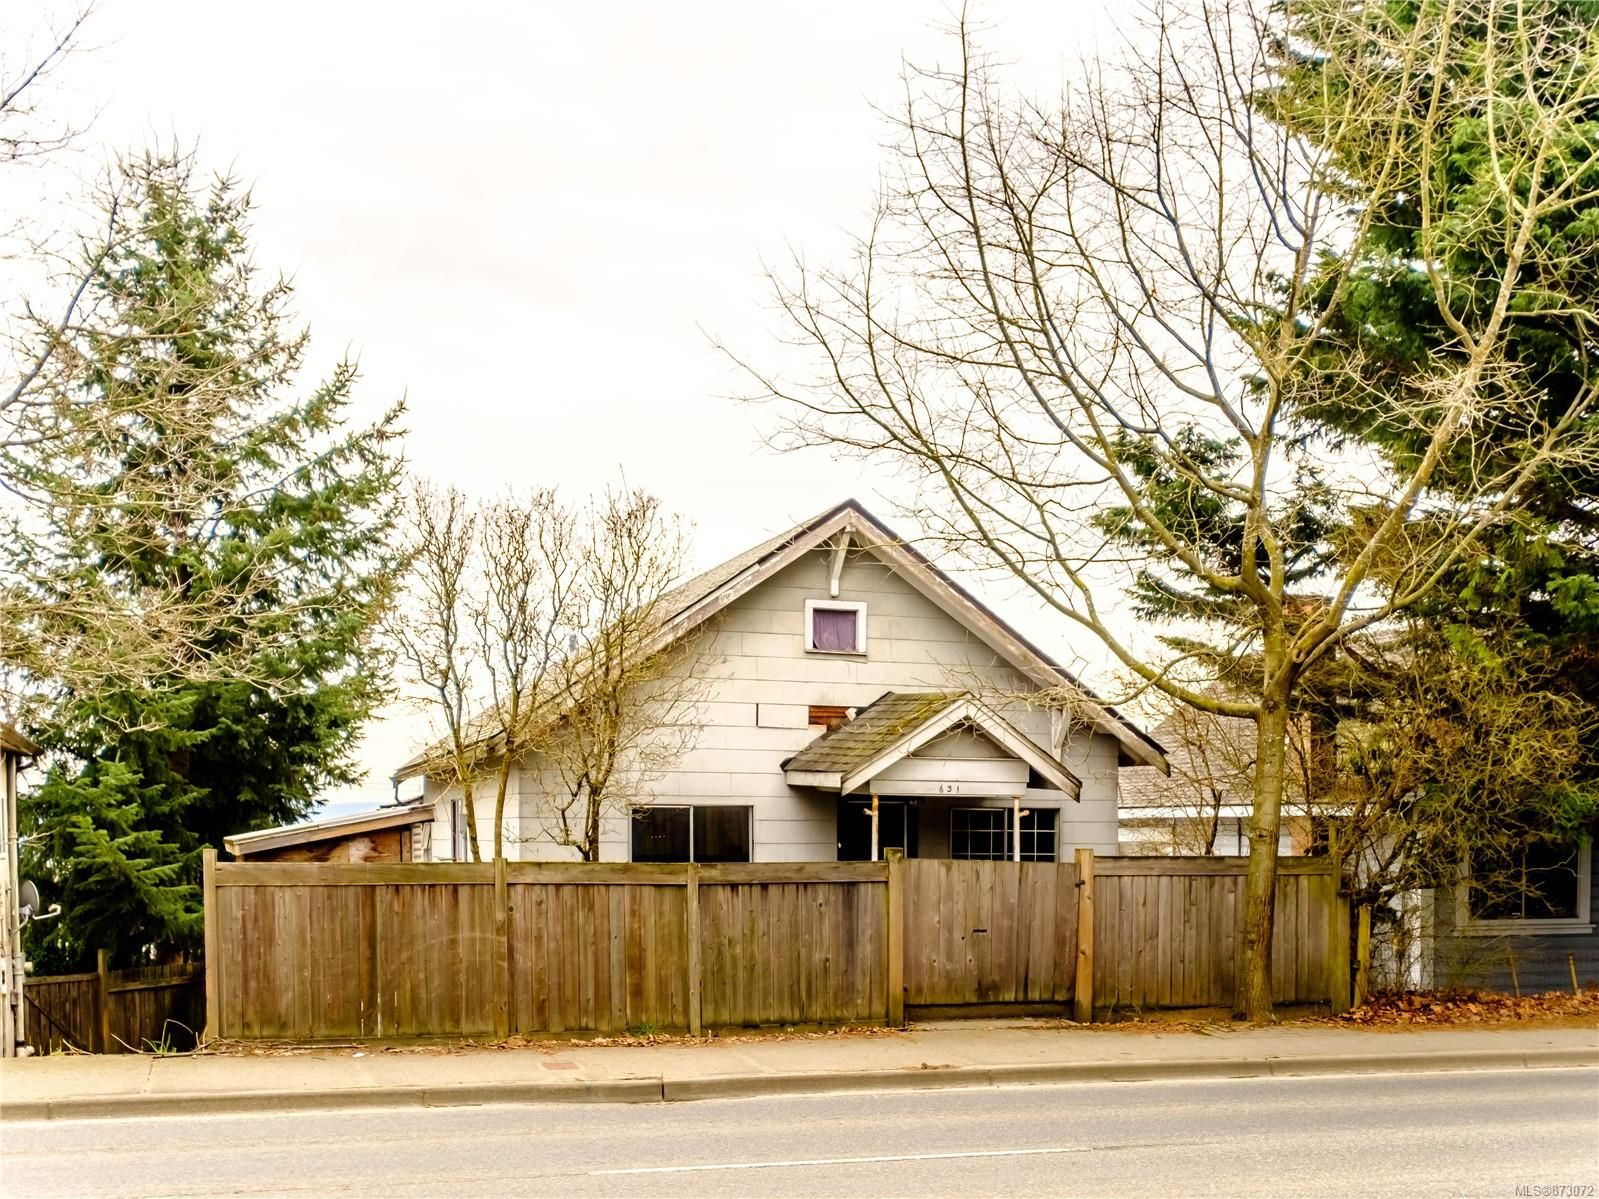 Main Photo: 631 Nicol St in : Na South Nanaimo House for sale (Nanaimo)  : MLS®# 873072